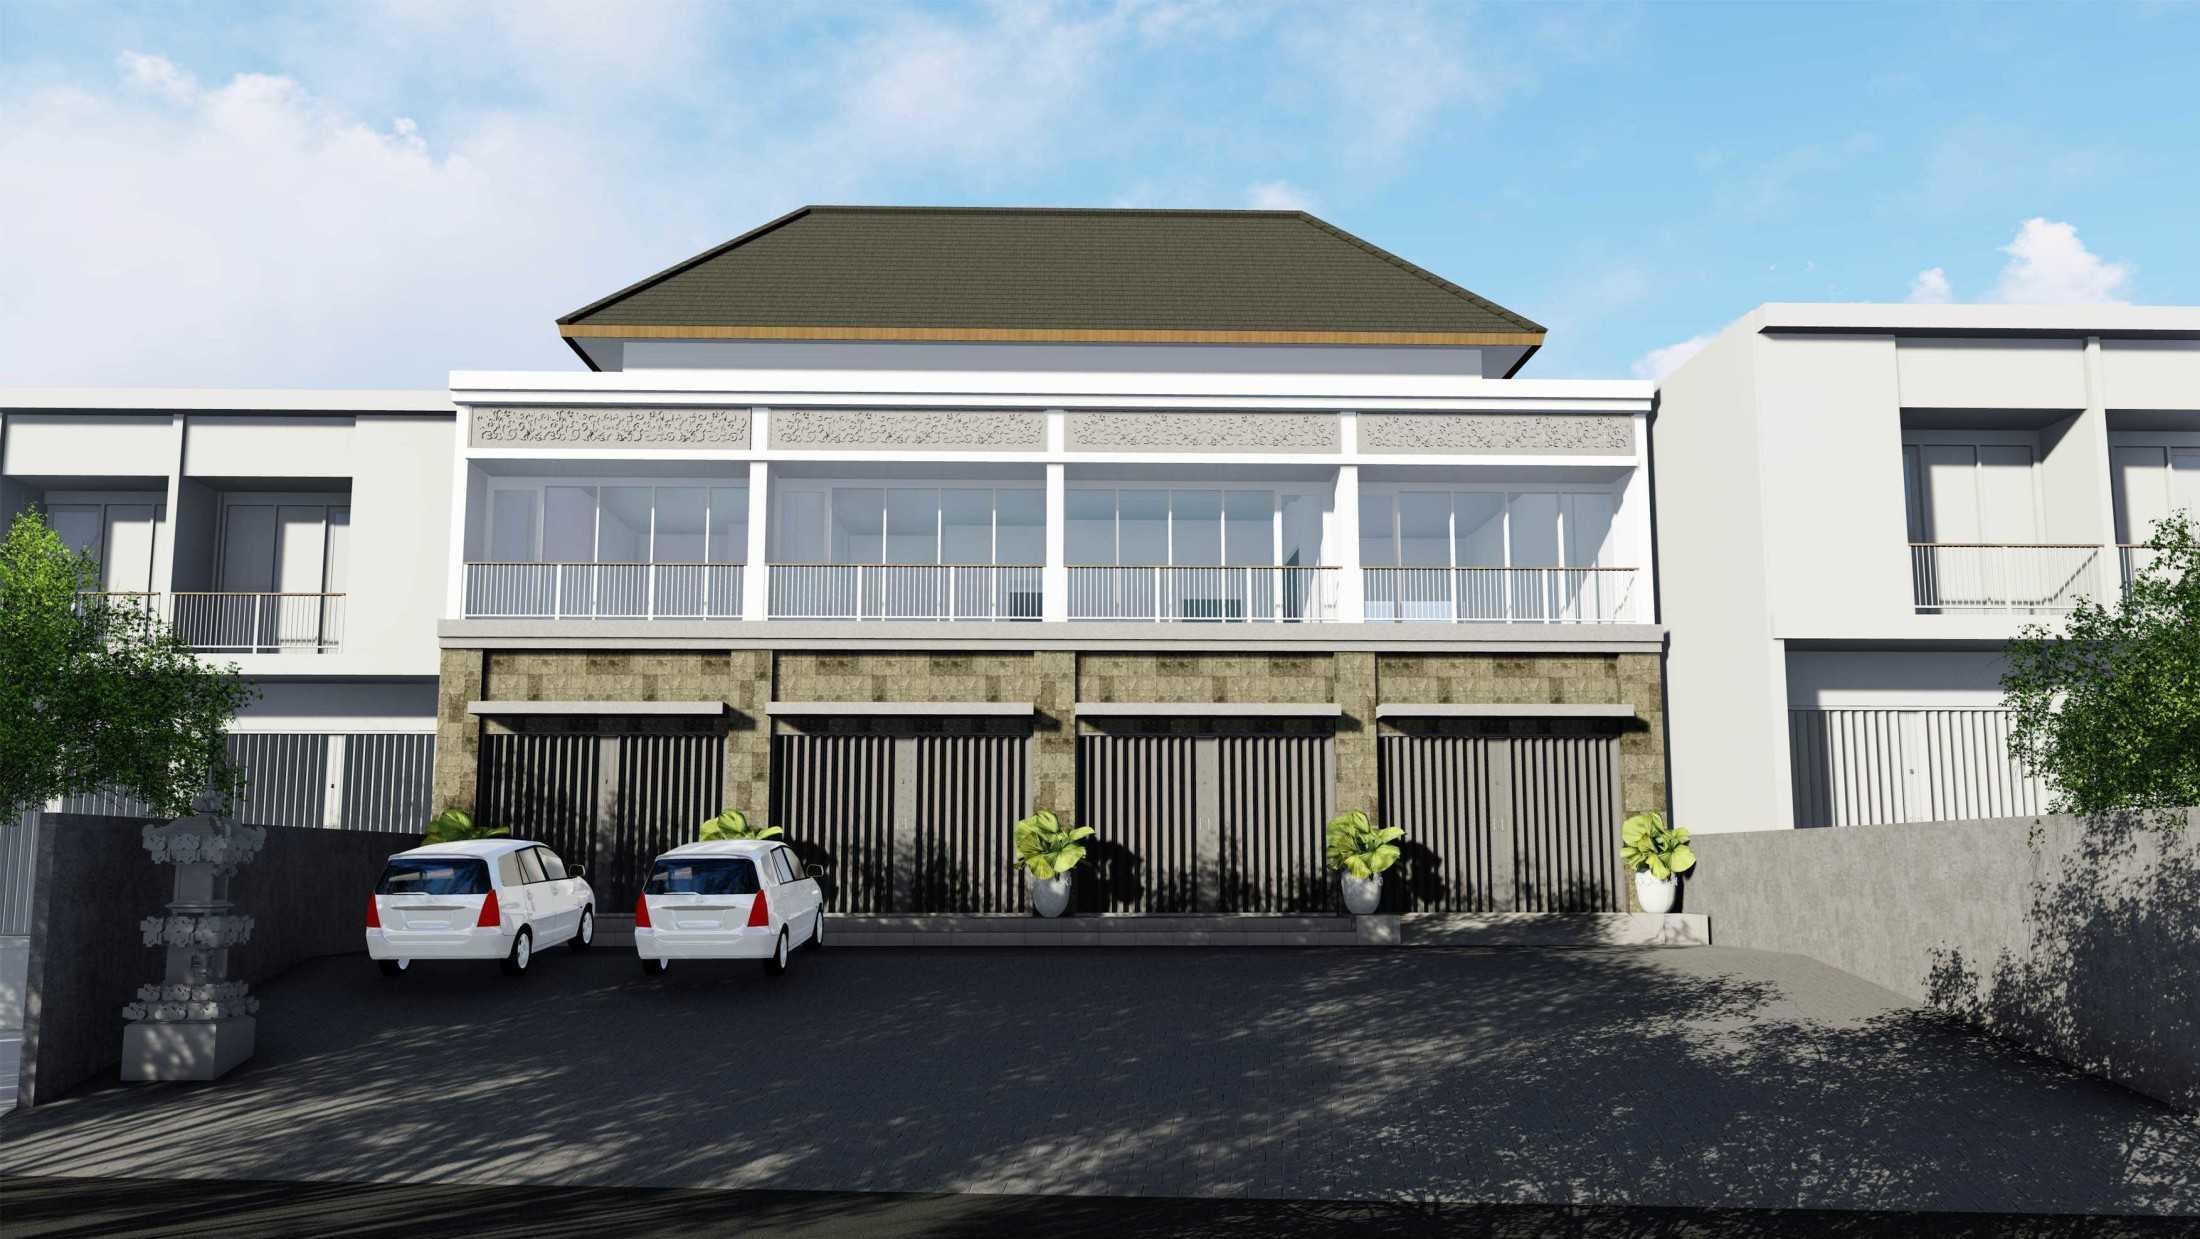 Revan Teggar Shop House & Room Apartment Kota Denpasar, Bali, Indonesia Kota Denpasar, Bali, Indonesia Revan-Teggar-Shop-House-Room-Apartment  124034